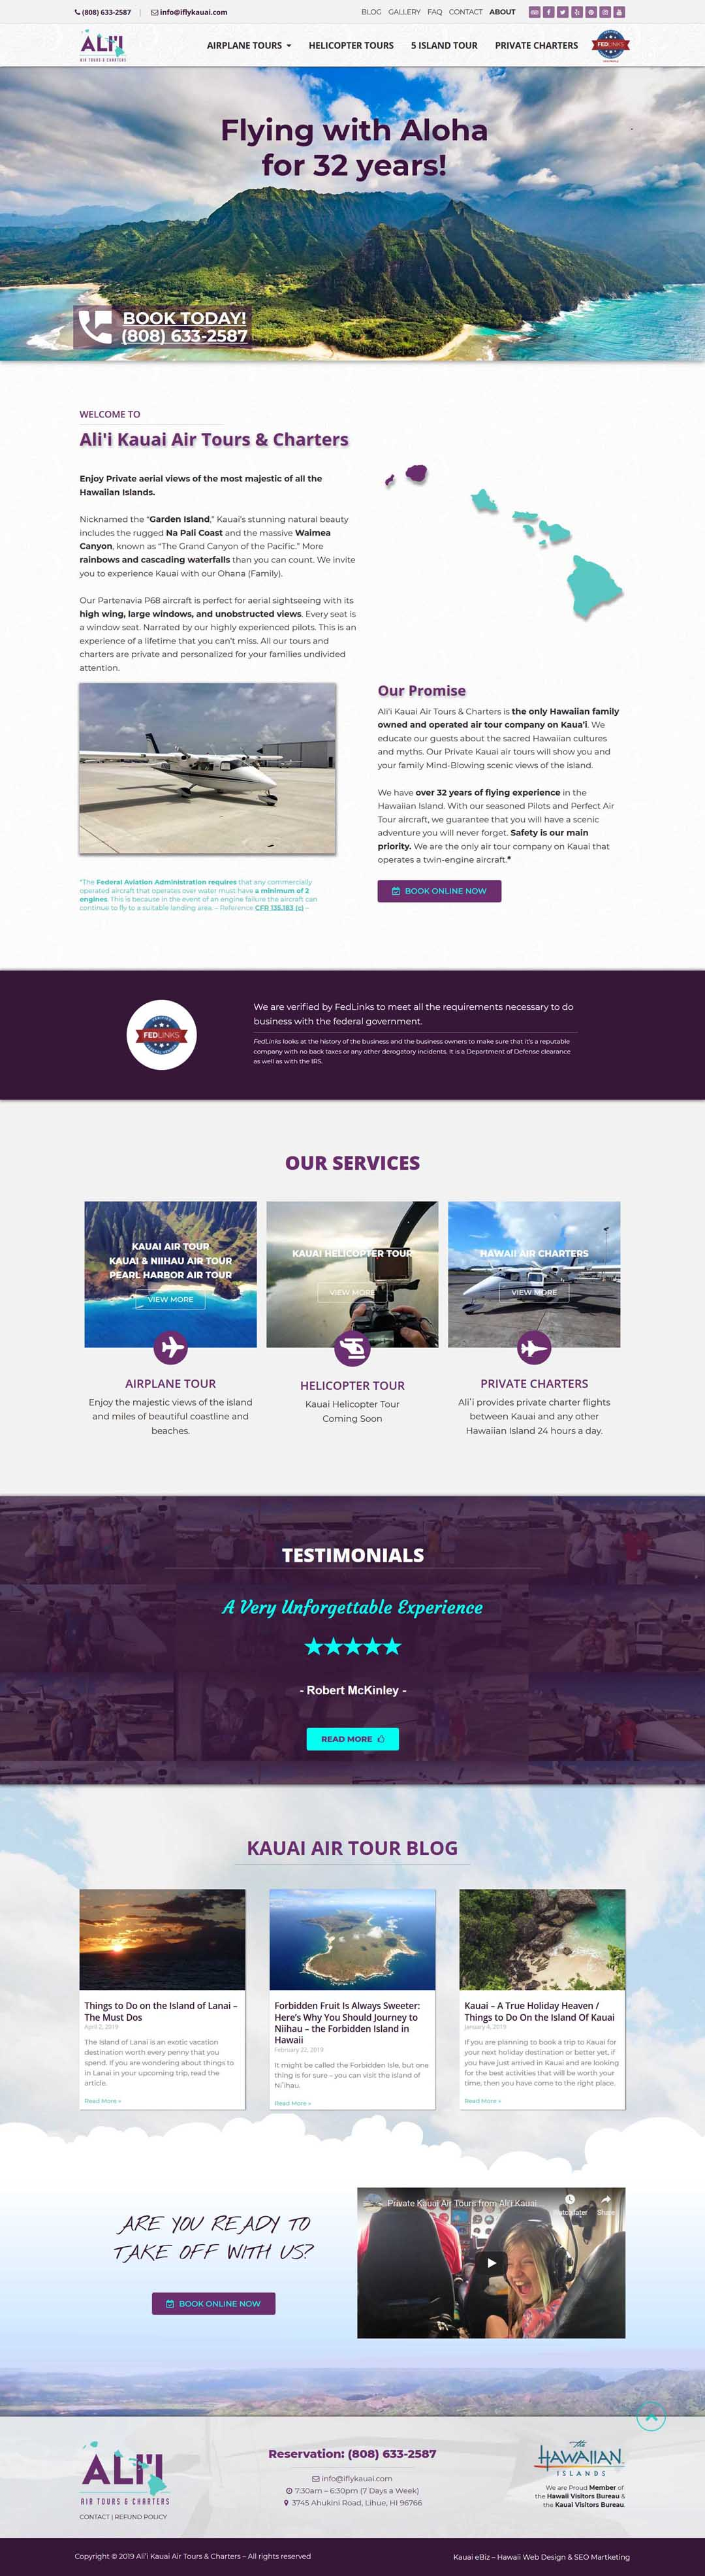 Hawaii Air Tour Company website